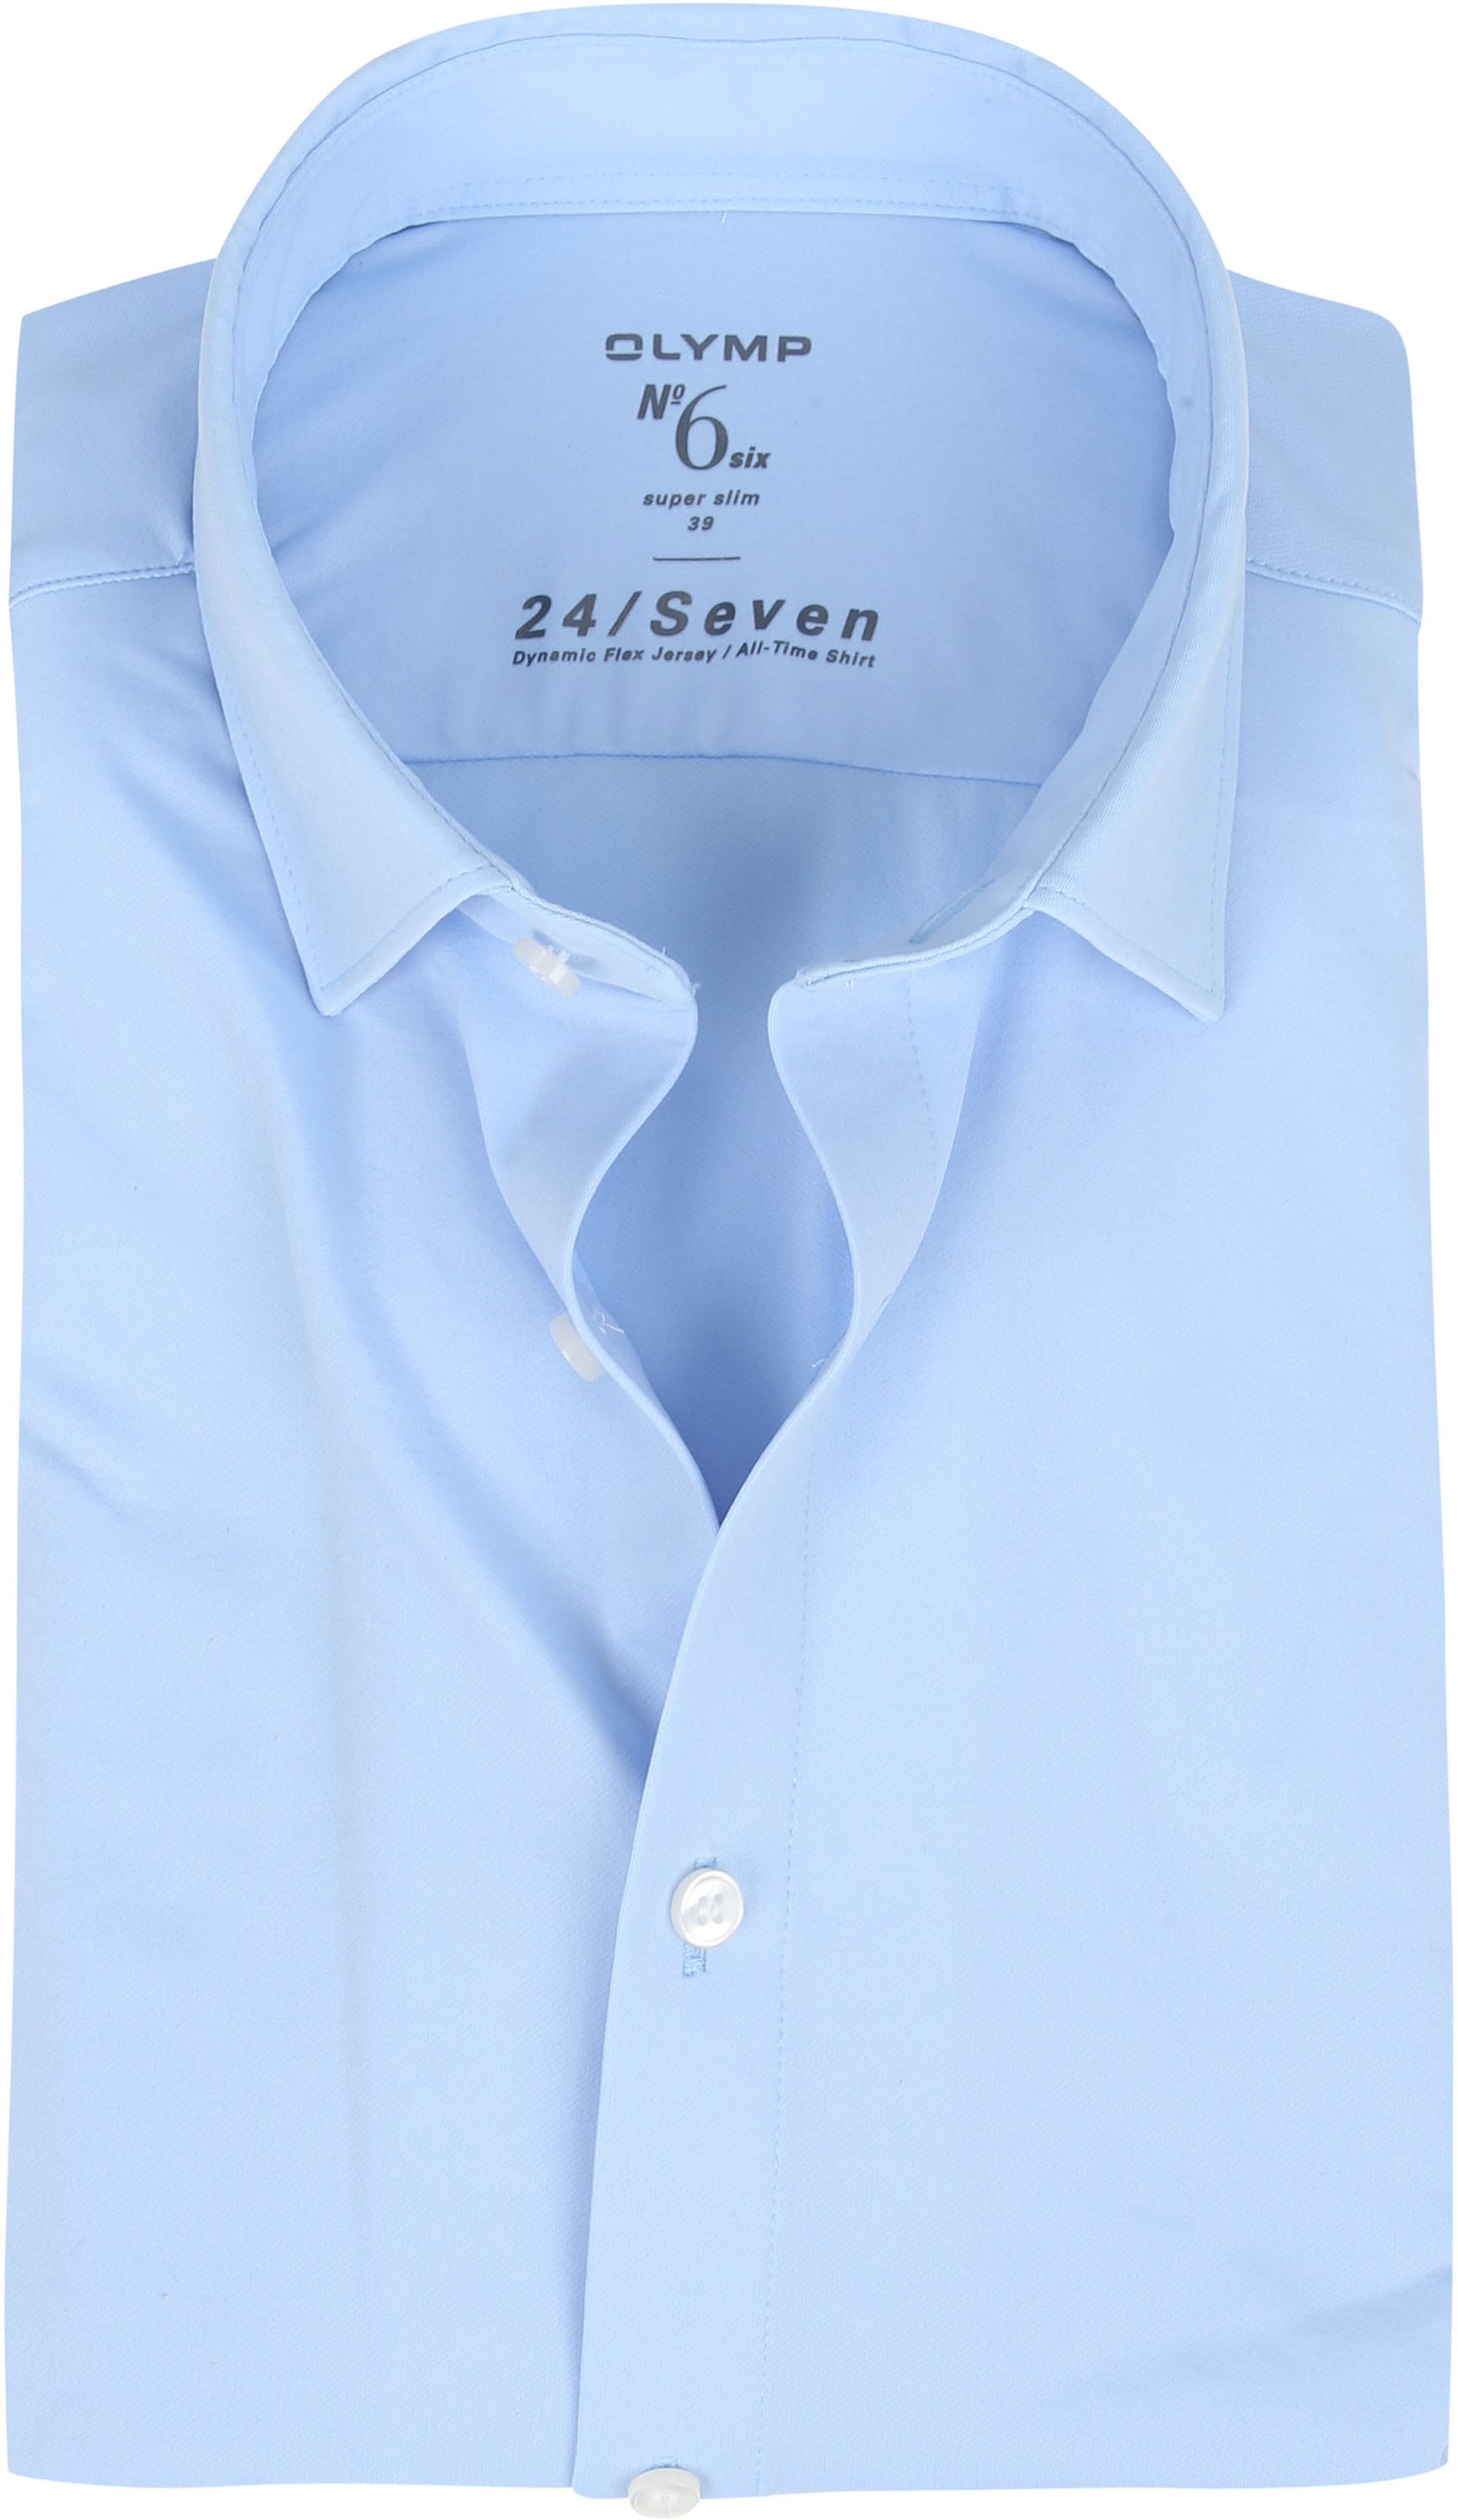 OLYMP No'6 Overhemd 24/Seven Blauw